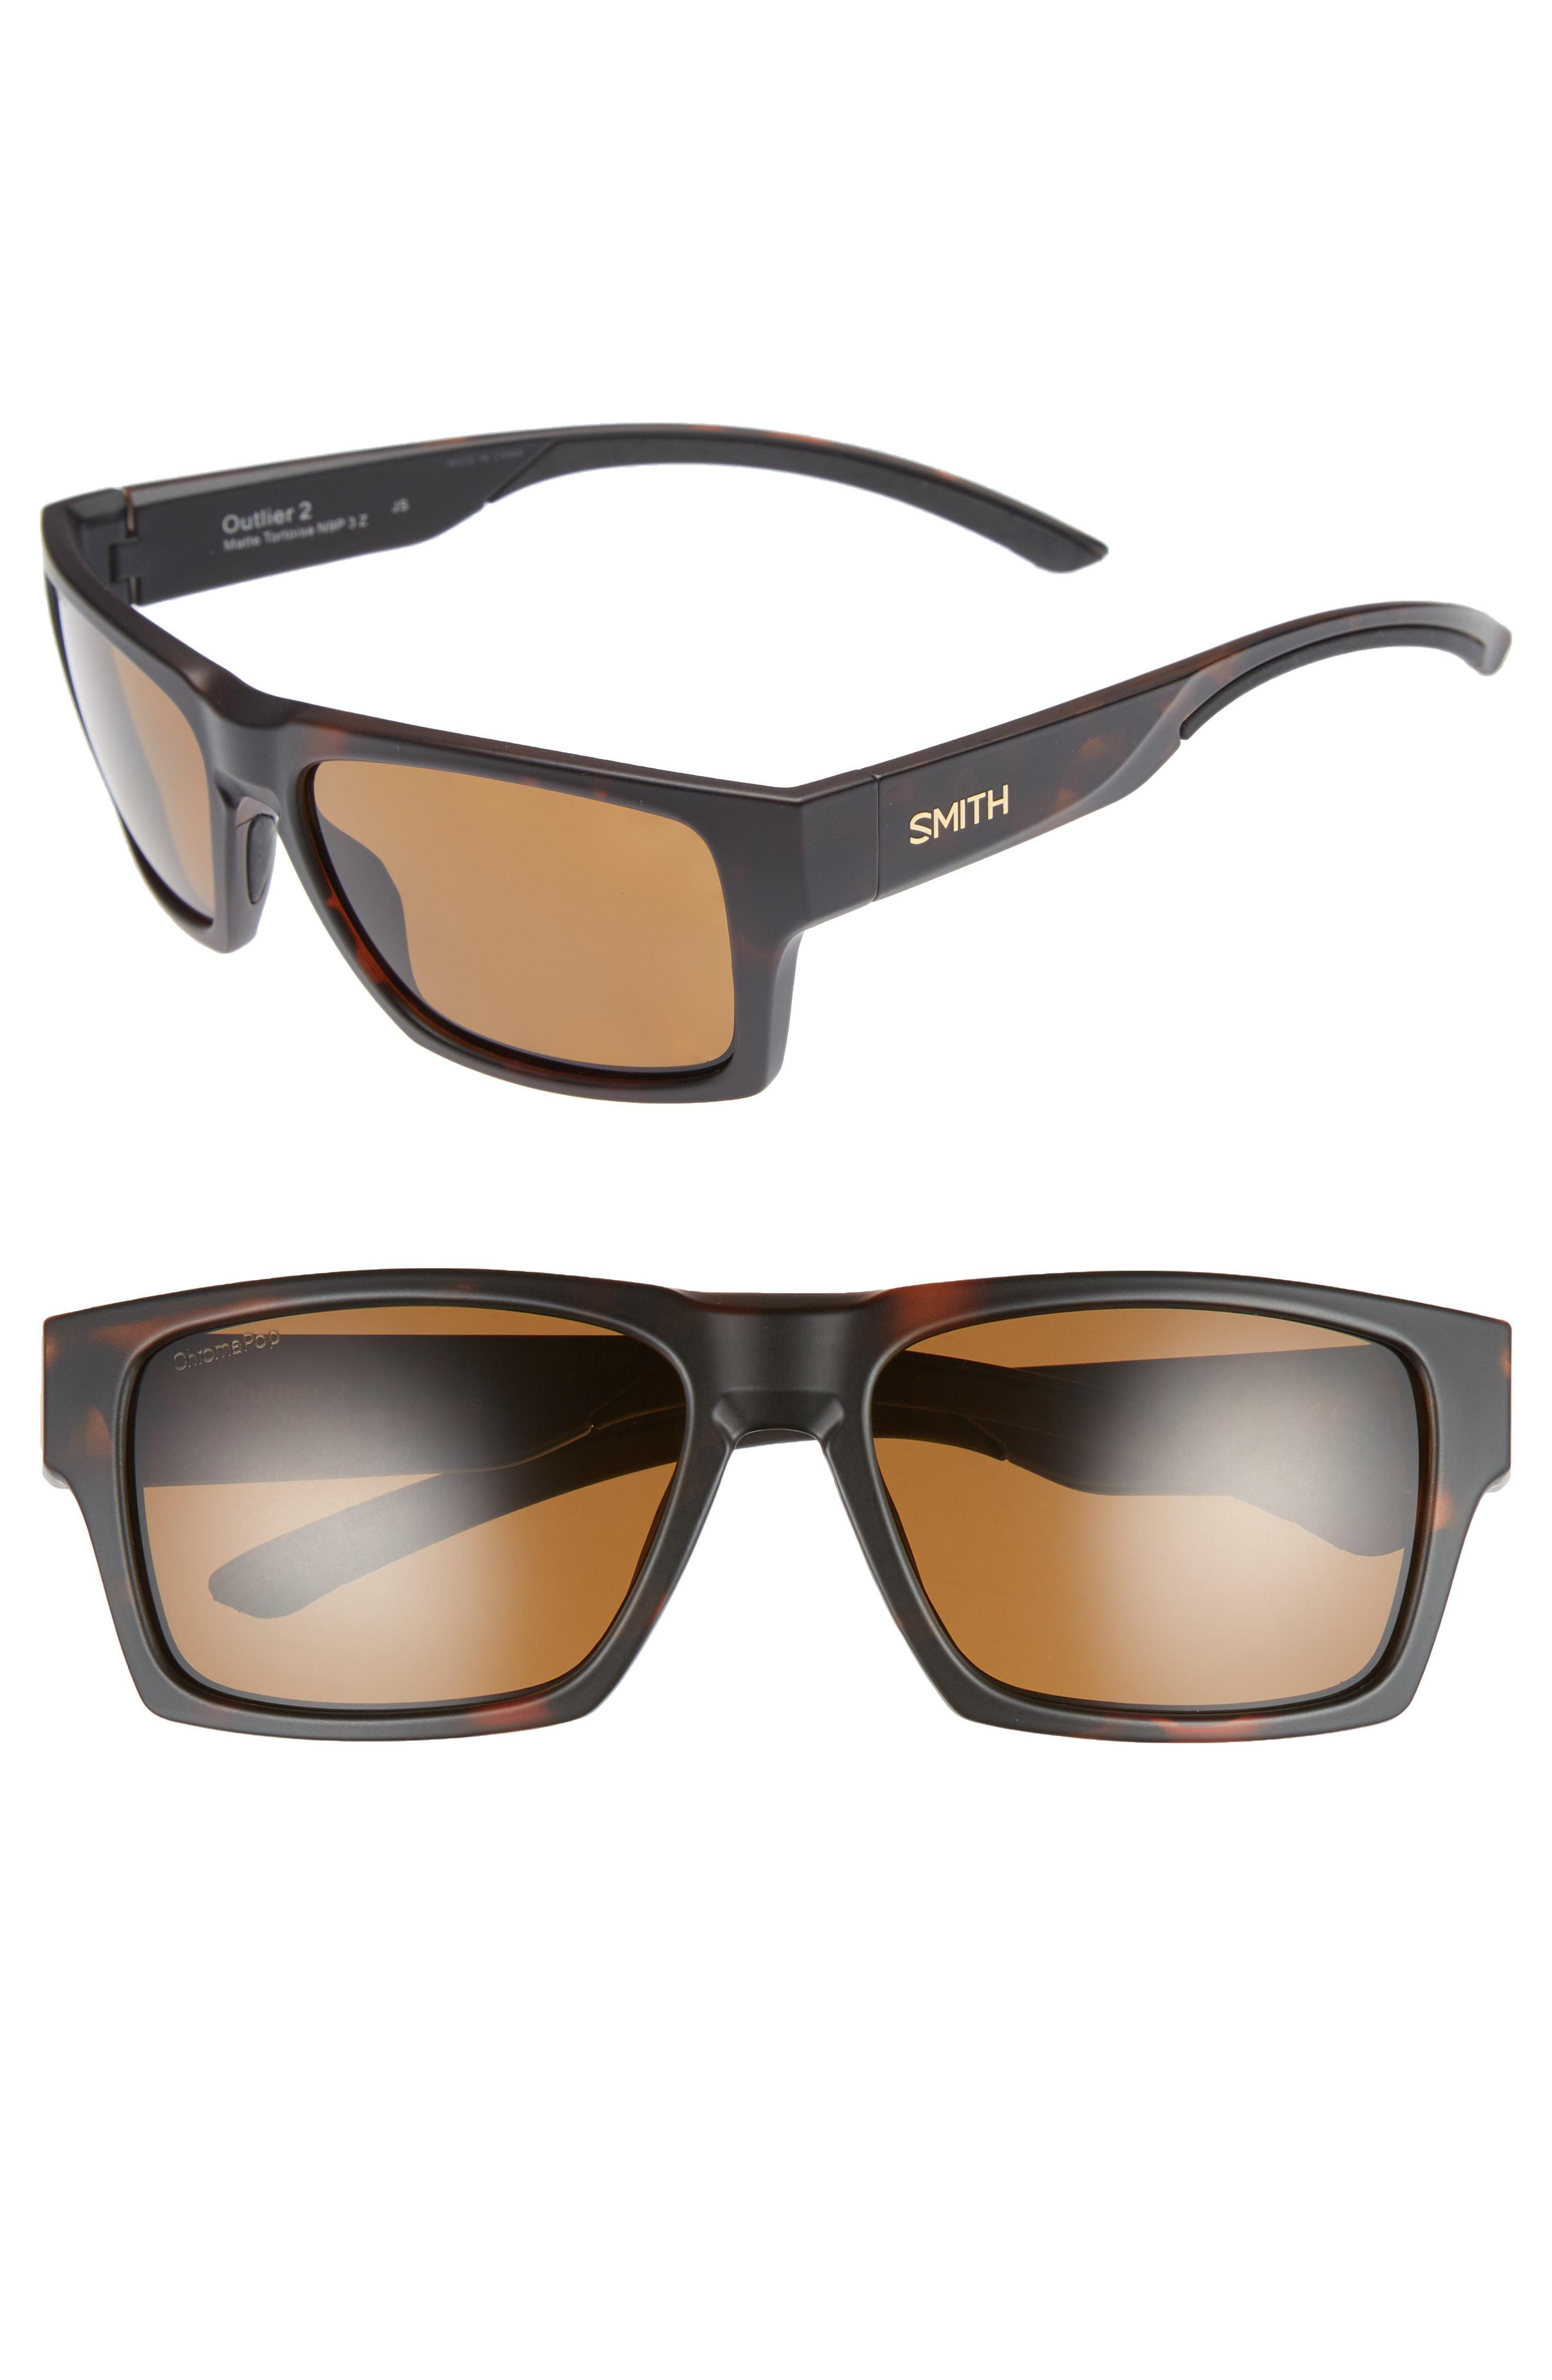 9af202034f Smith - Brown Outlier 2 57mm Chromapop(tm) Sunglasses for Men - Lyst. View  fullscreen